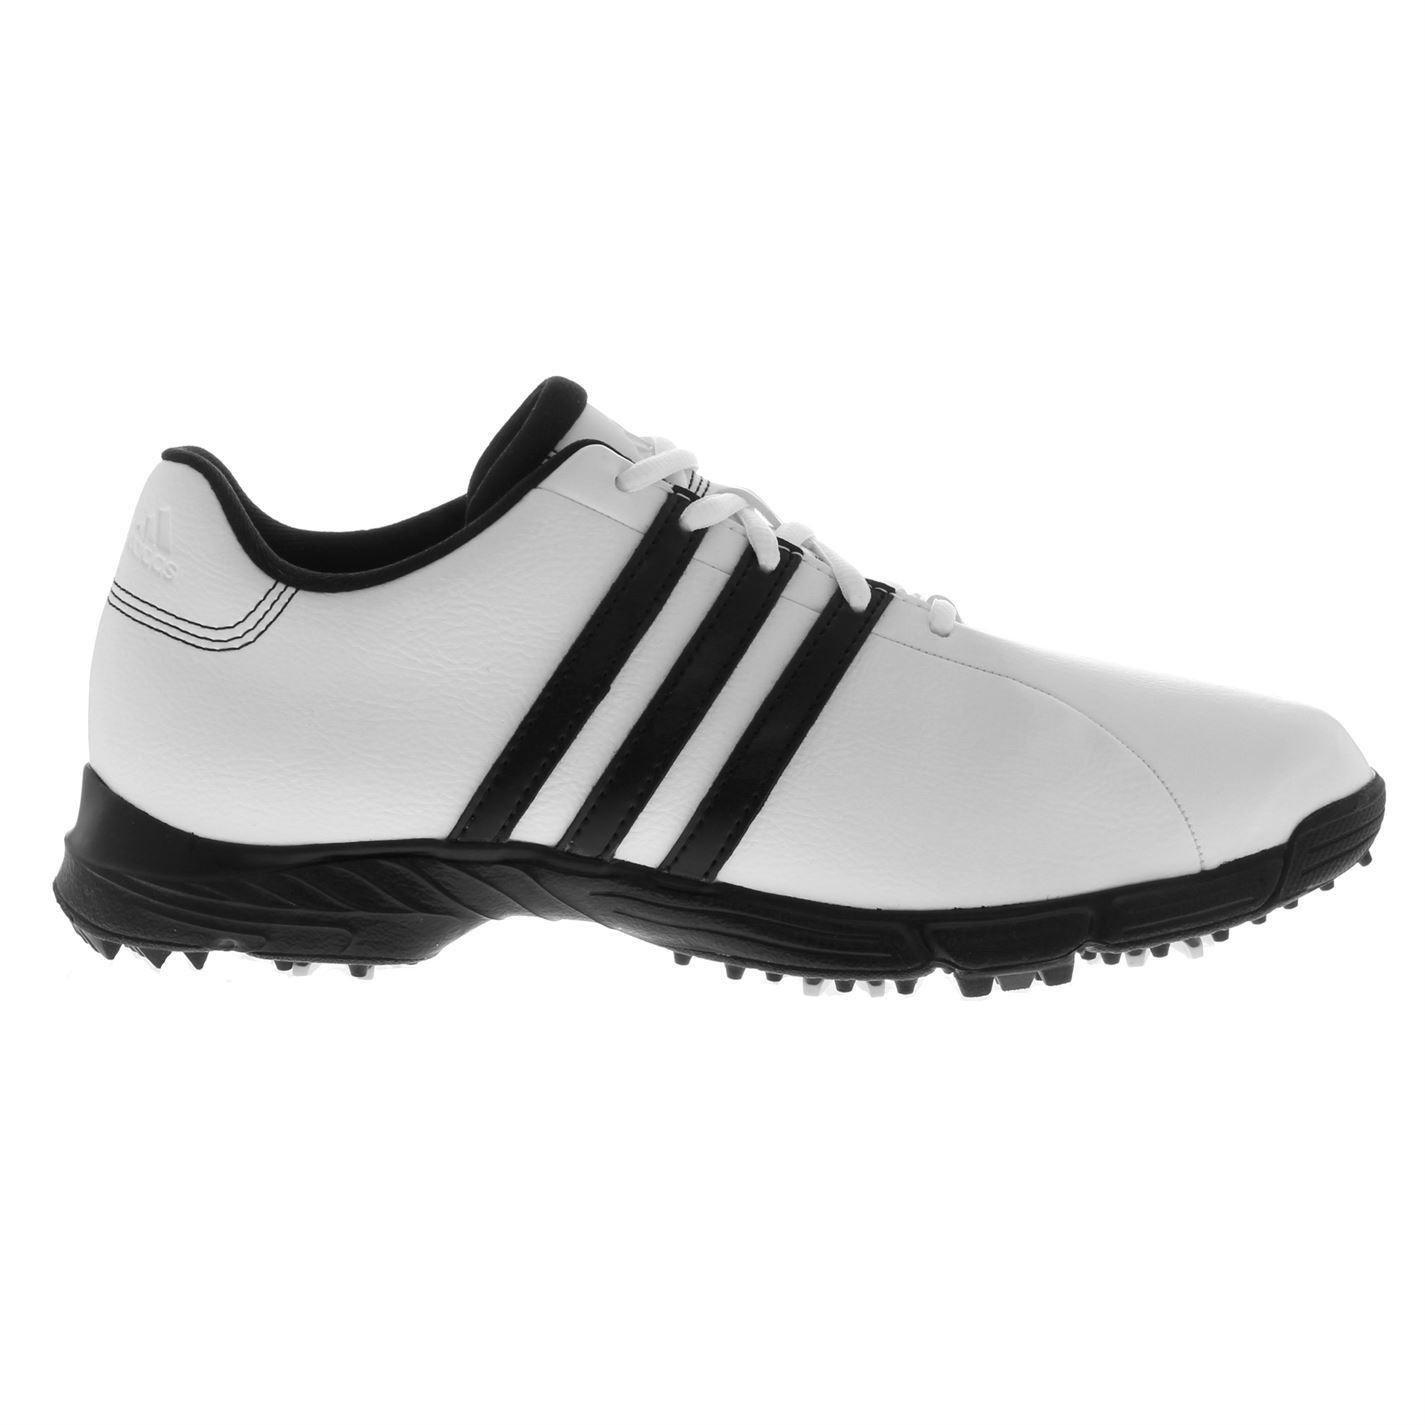 adidas-Golflite-Golf-Shoes-Mens-Spikes-Footwear thumbnail 18